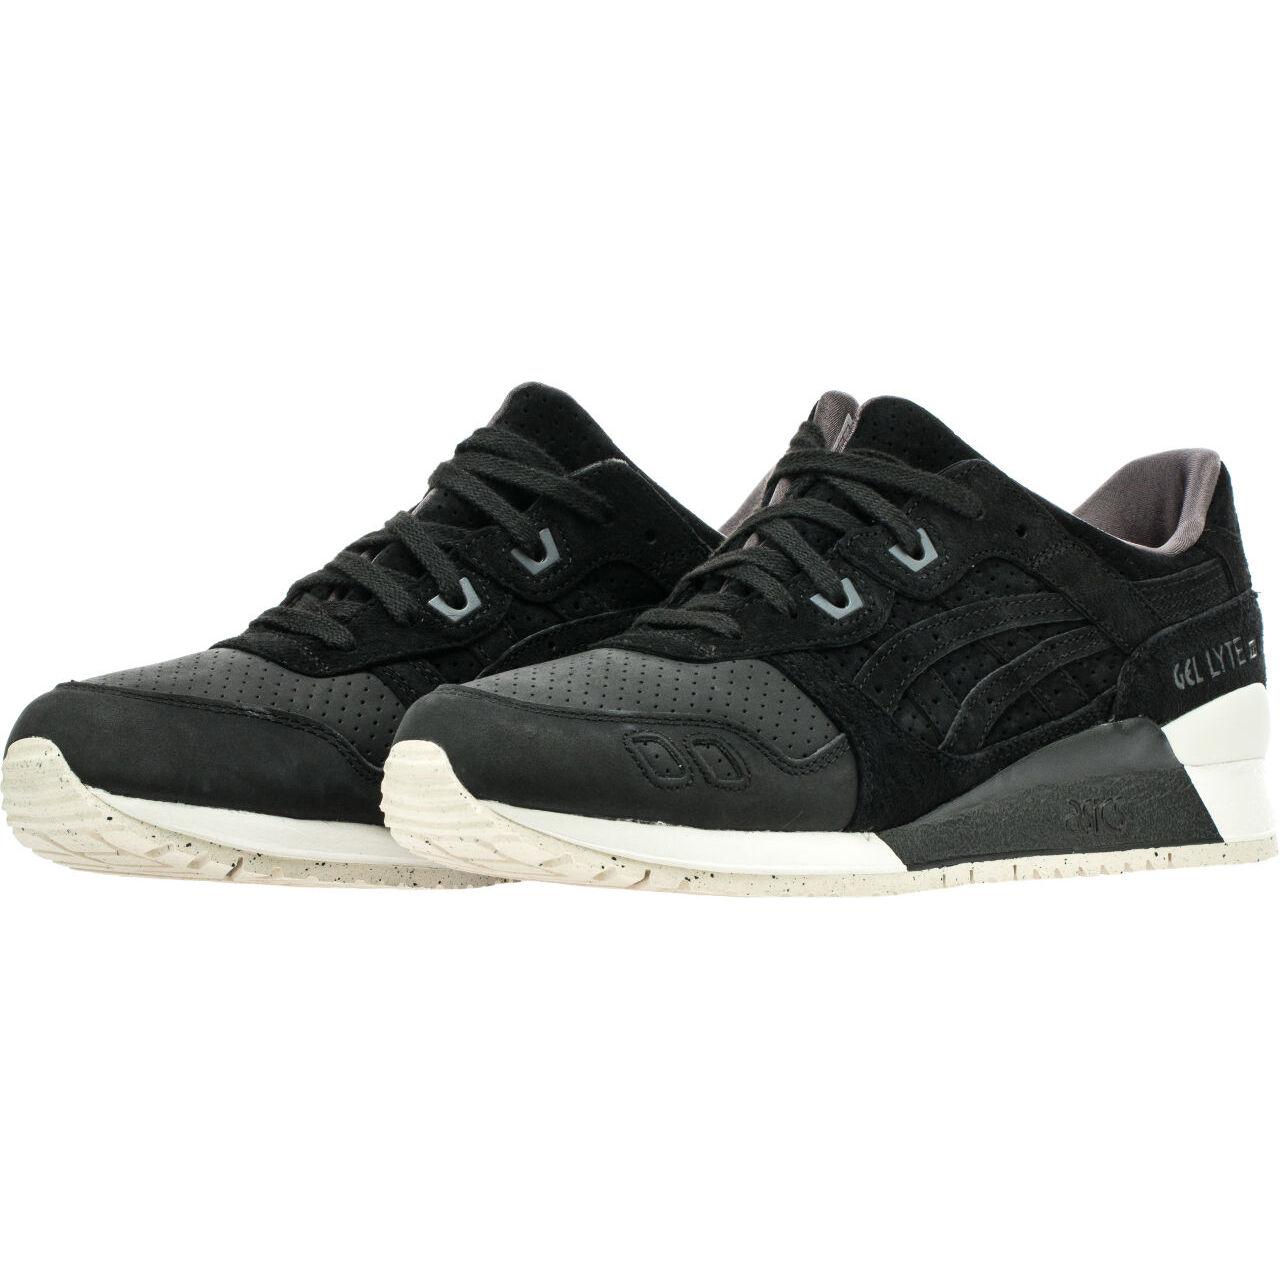 Asics Tiger Mens Mens Mens Gel-Lyte III 3 Perforated Black Classic Retro shoes H7E0L-9090 d4f782